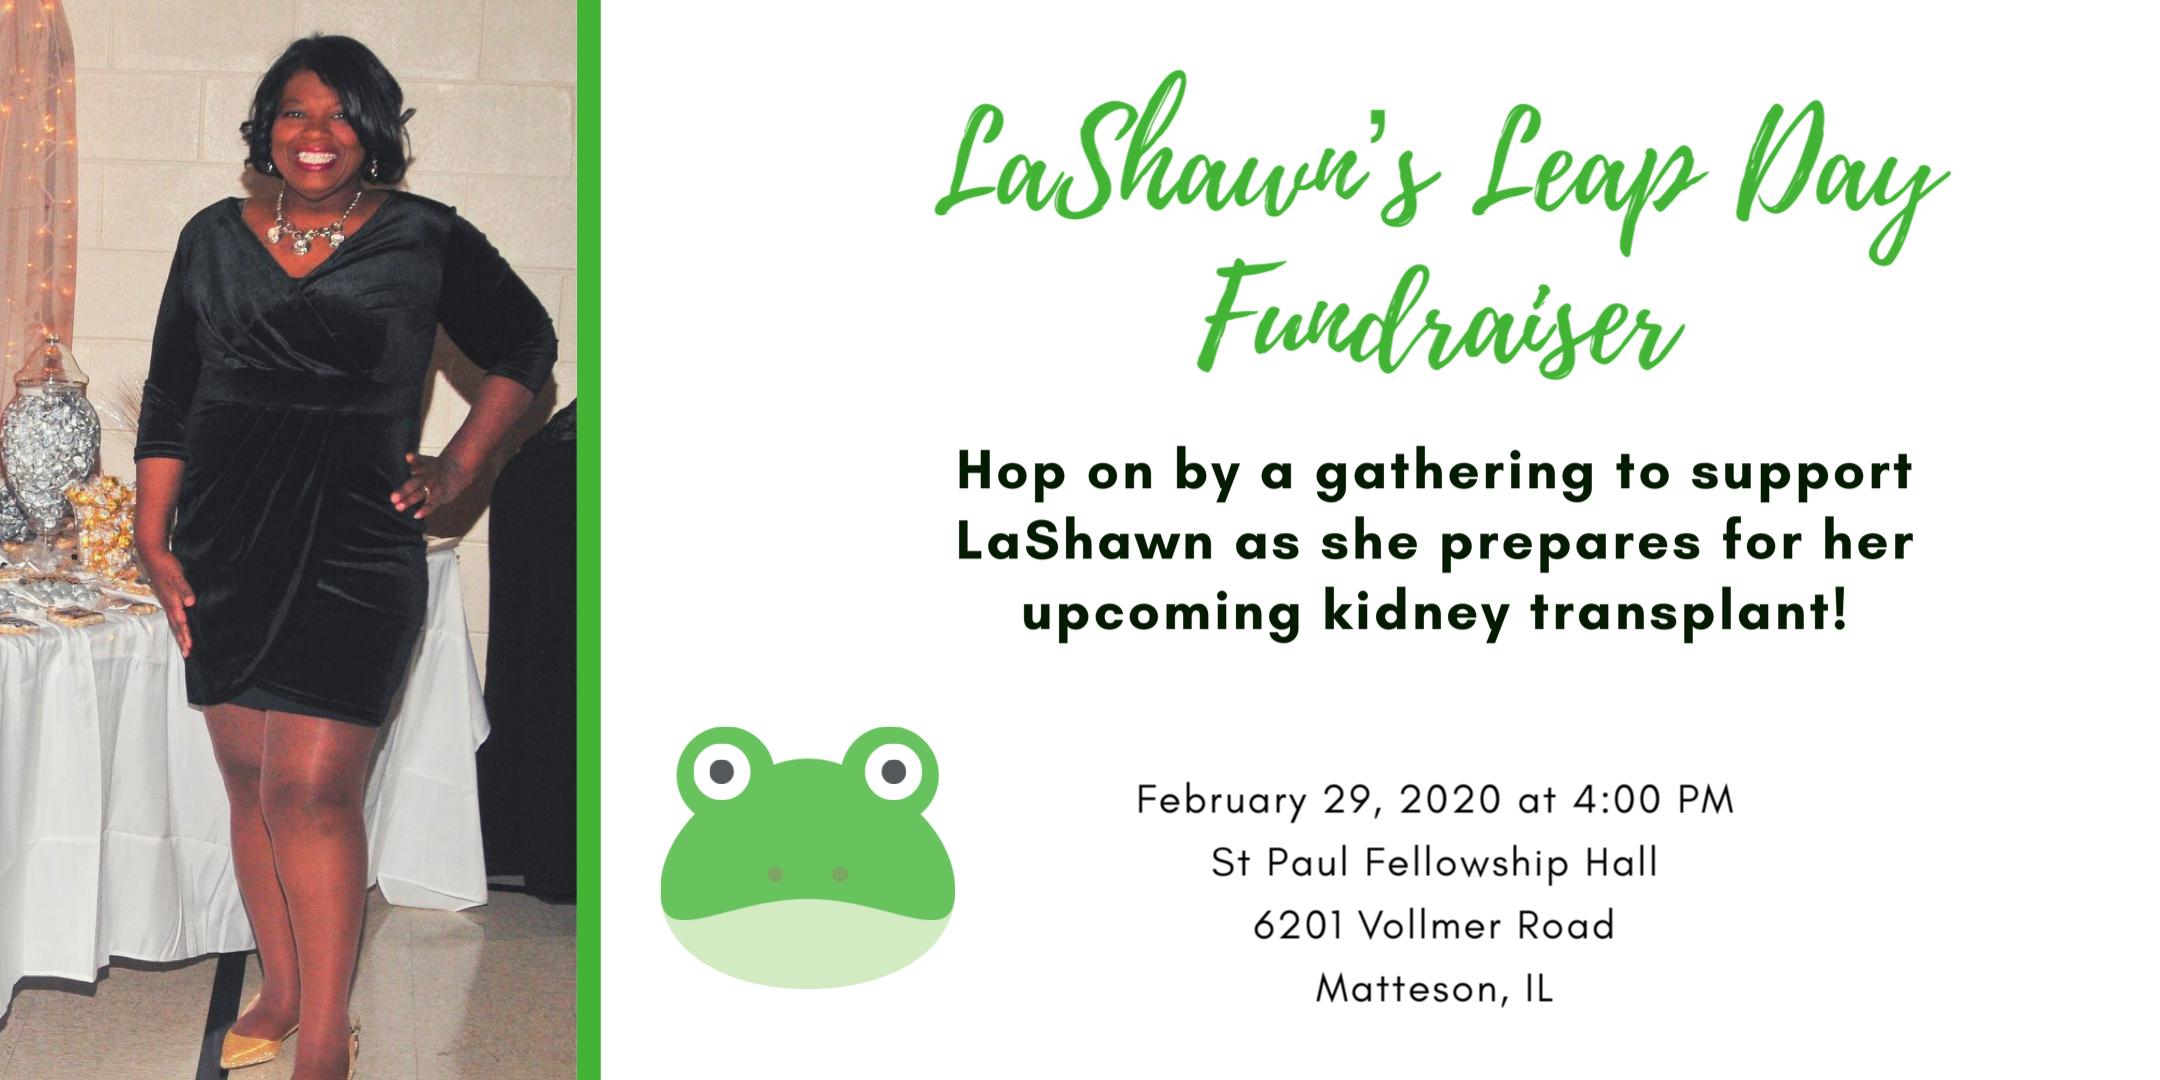 LaShawn's Leap Day Fundraiser